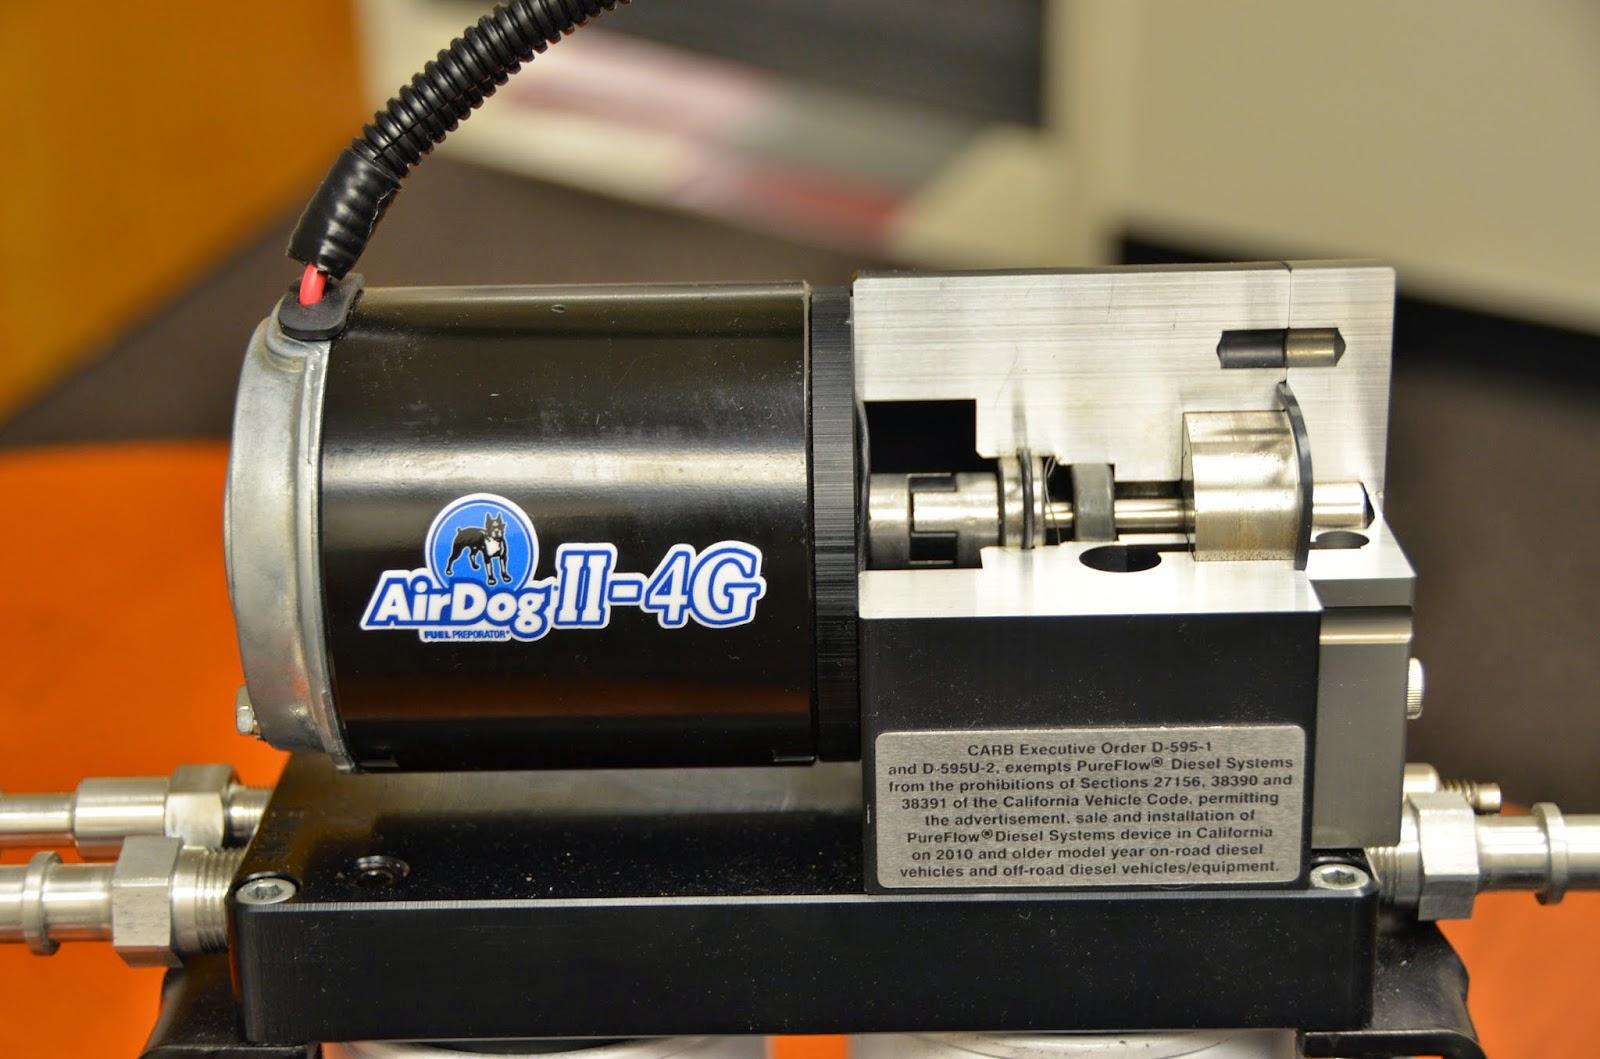 Toxic Diesel Performance : Duramax New AirDog II-4G Fuel